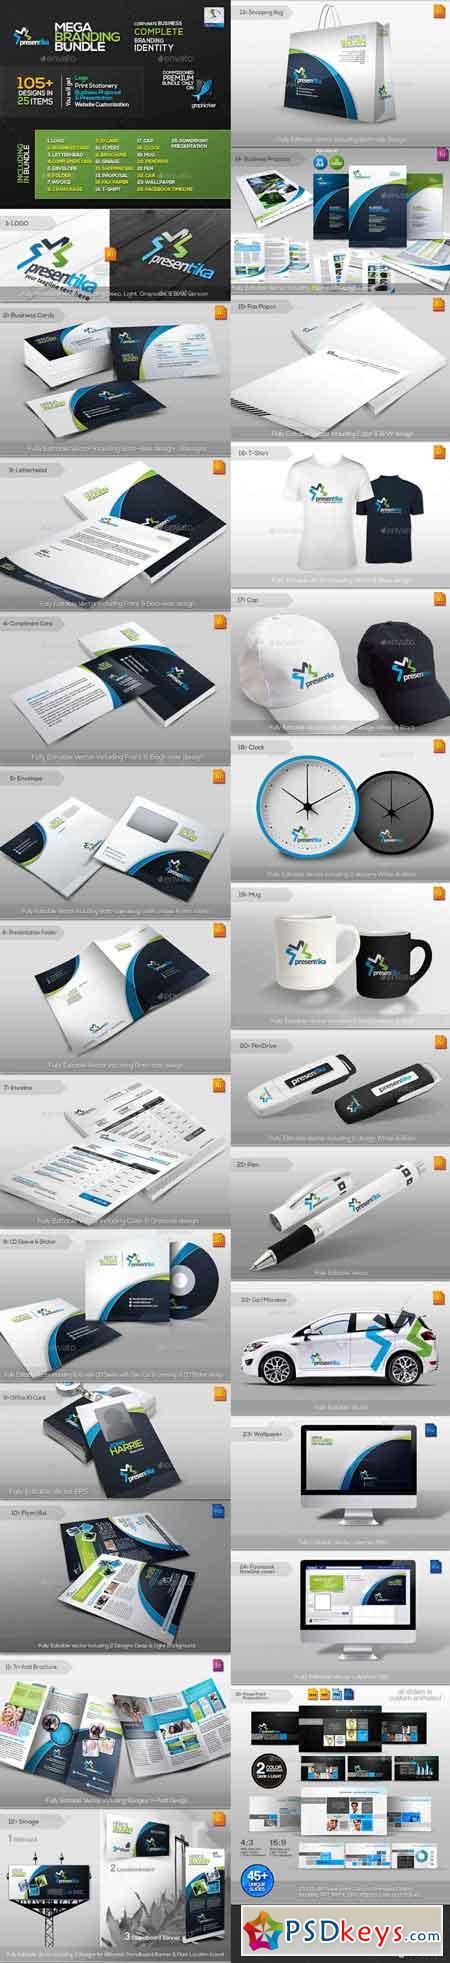 Presentica Business Identity Mega Branding Bundle 2994870